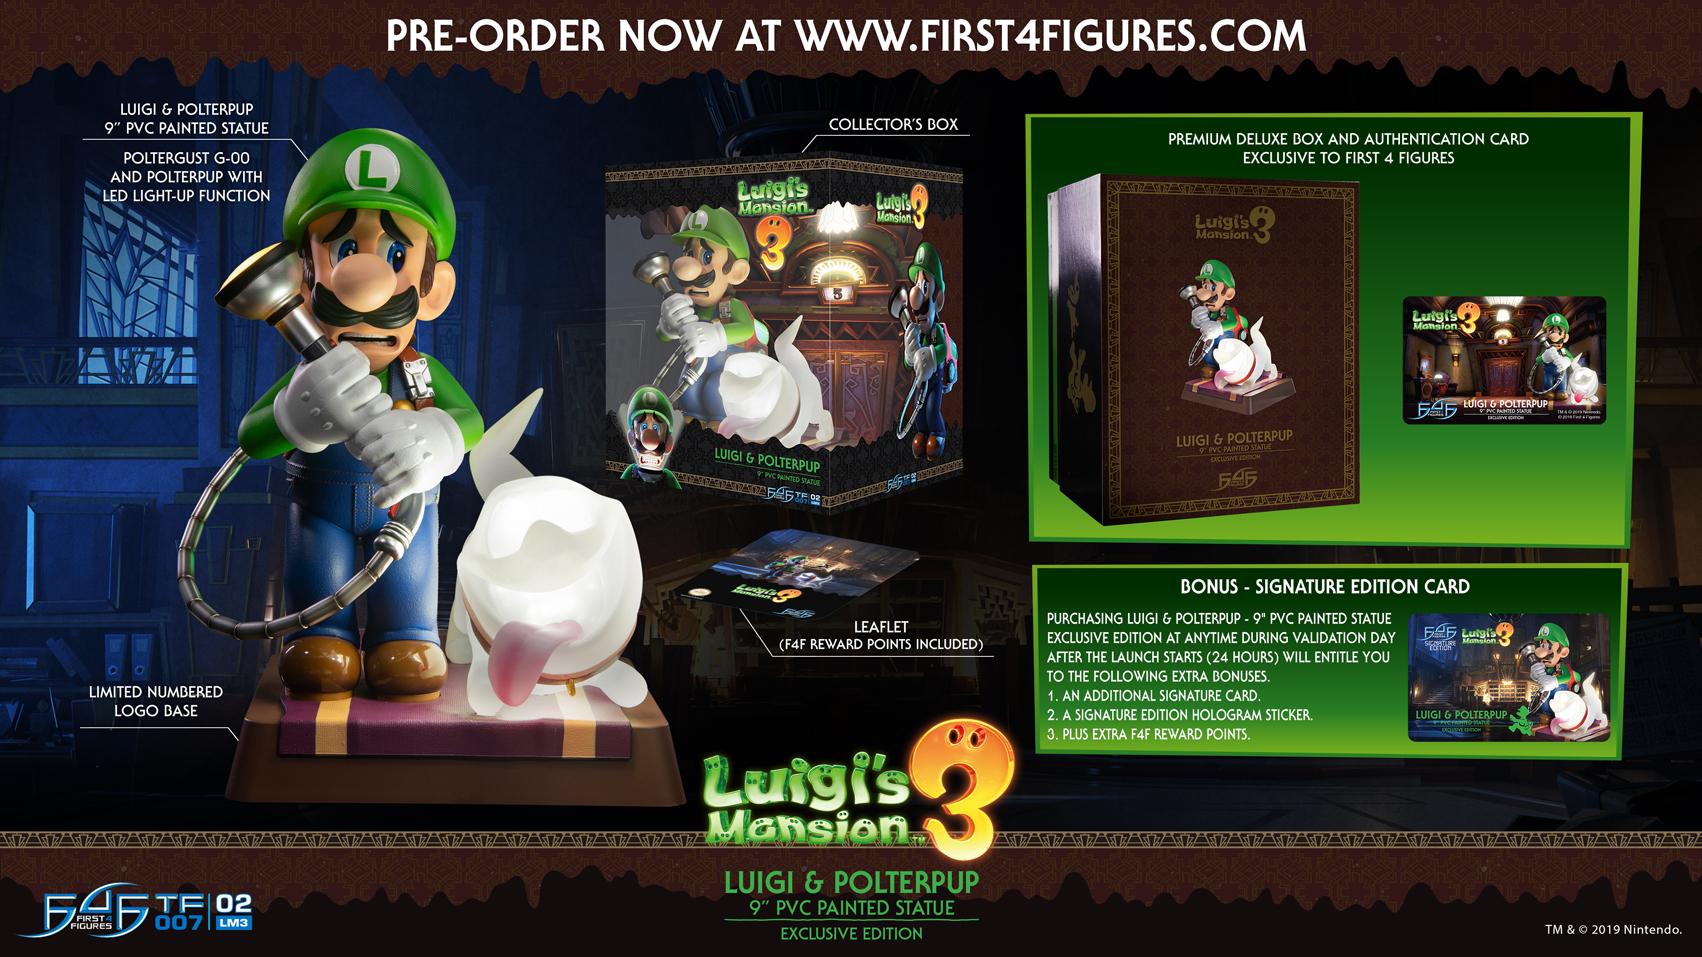 Luigi & Polterpup (Exclusive Edition)